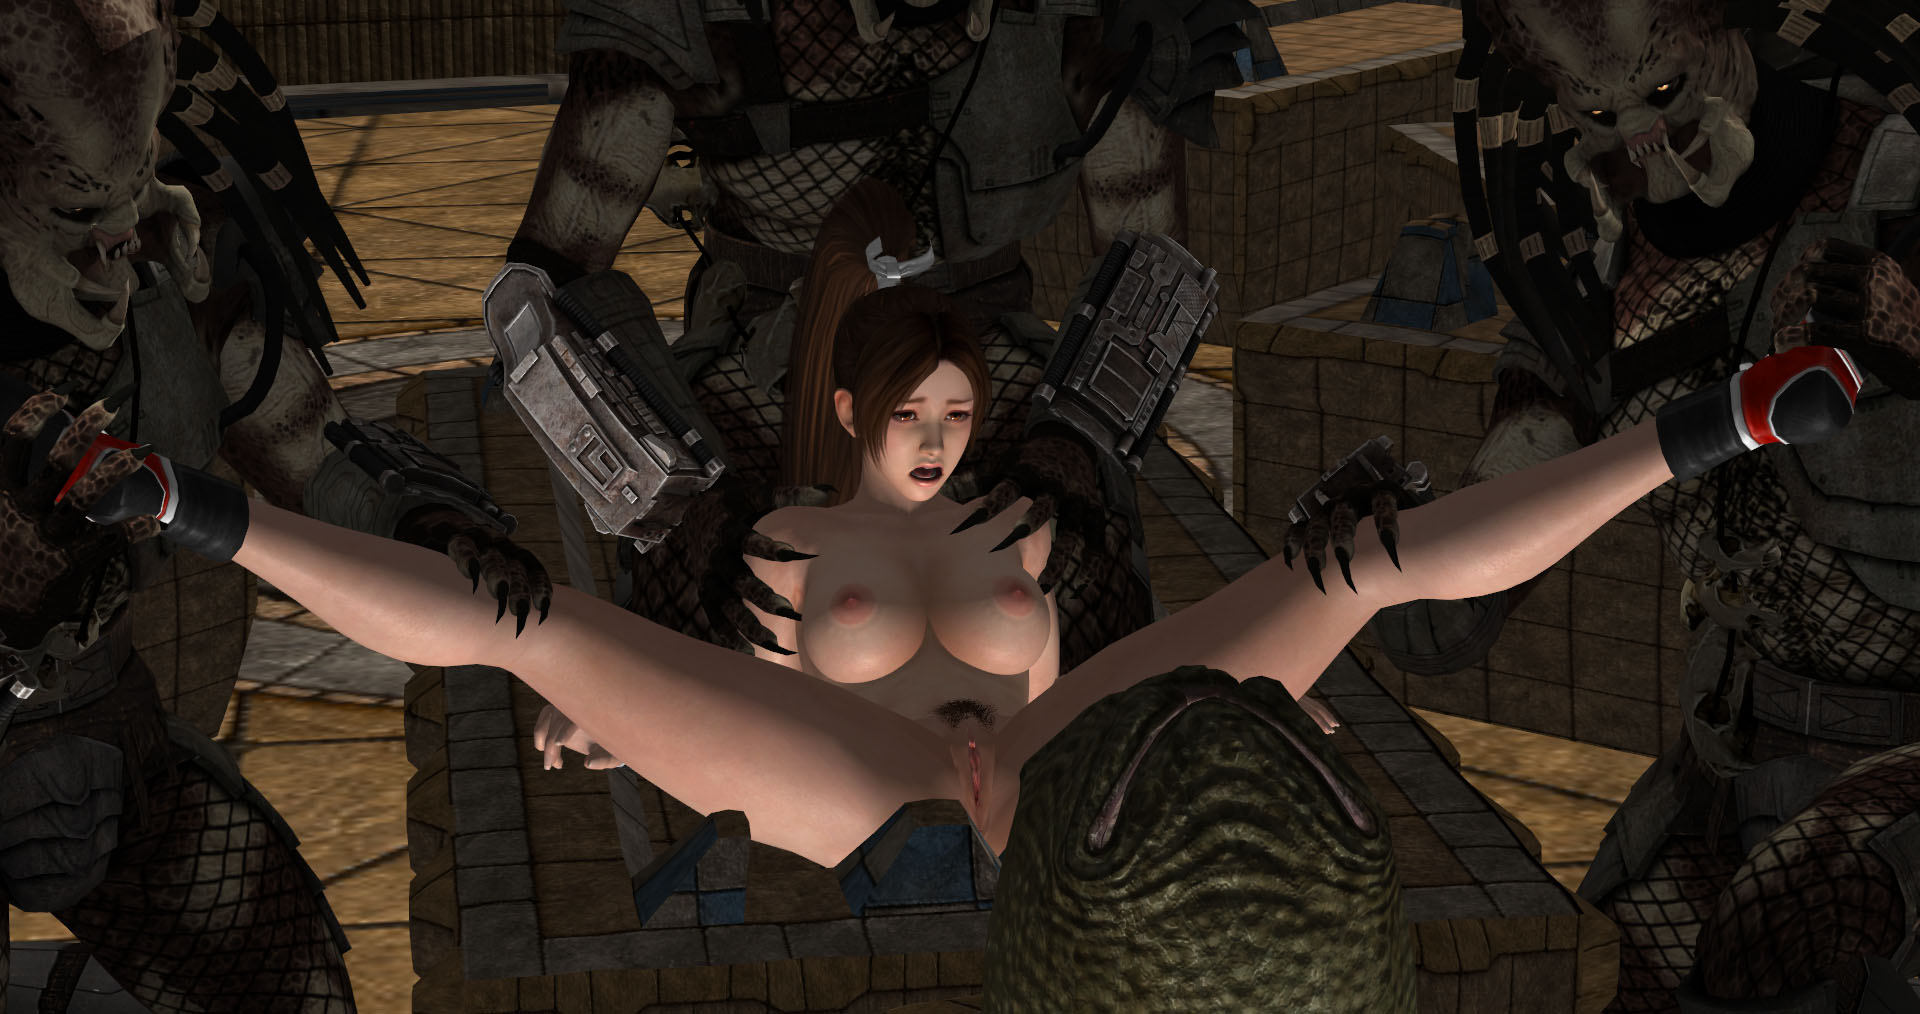 mai_fucked_by_predators_0126_layer_39_by_bitemonsters-dbpi3qv.jpg